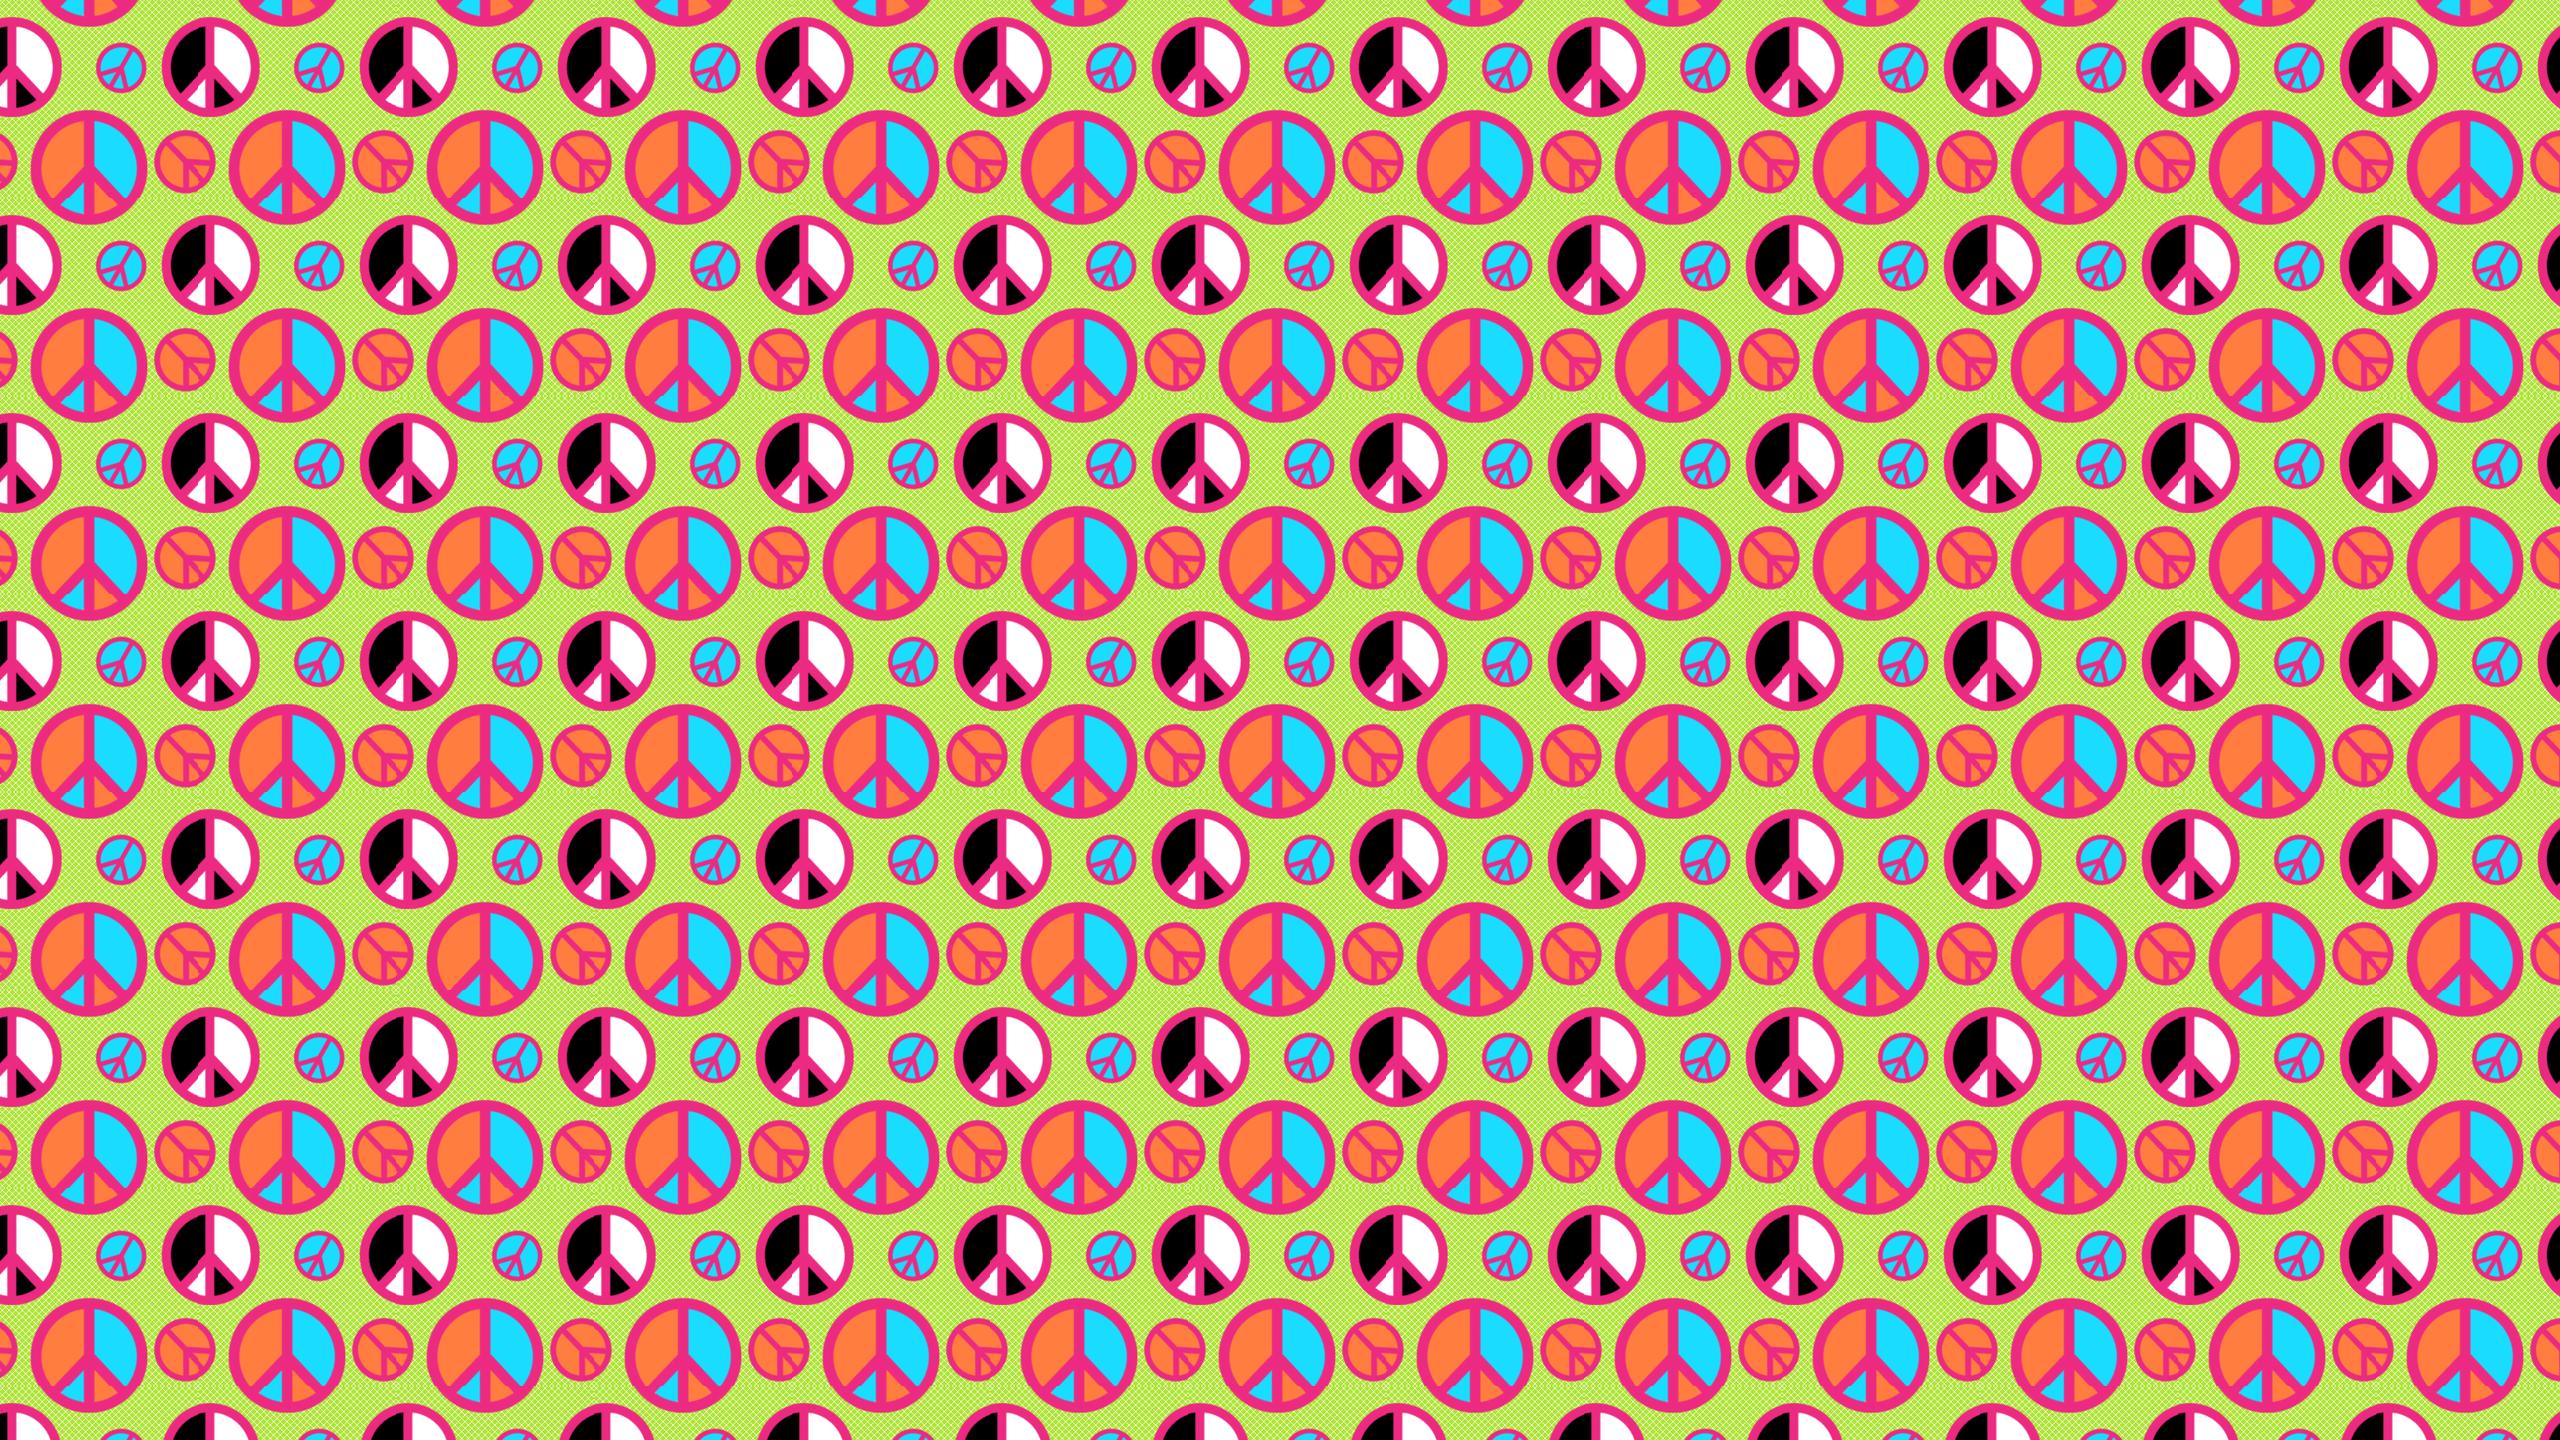 Lime Peace Signs Desktop Wallpaper 2560x1440